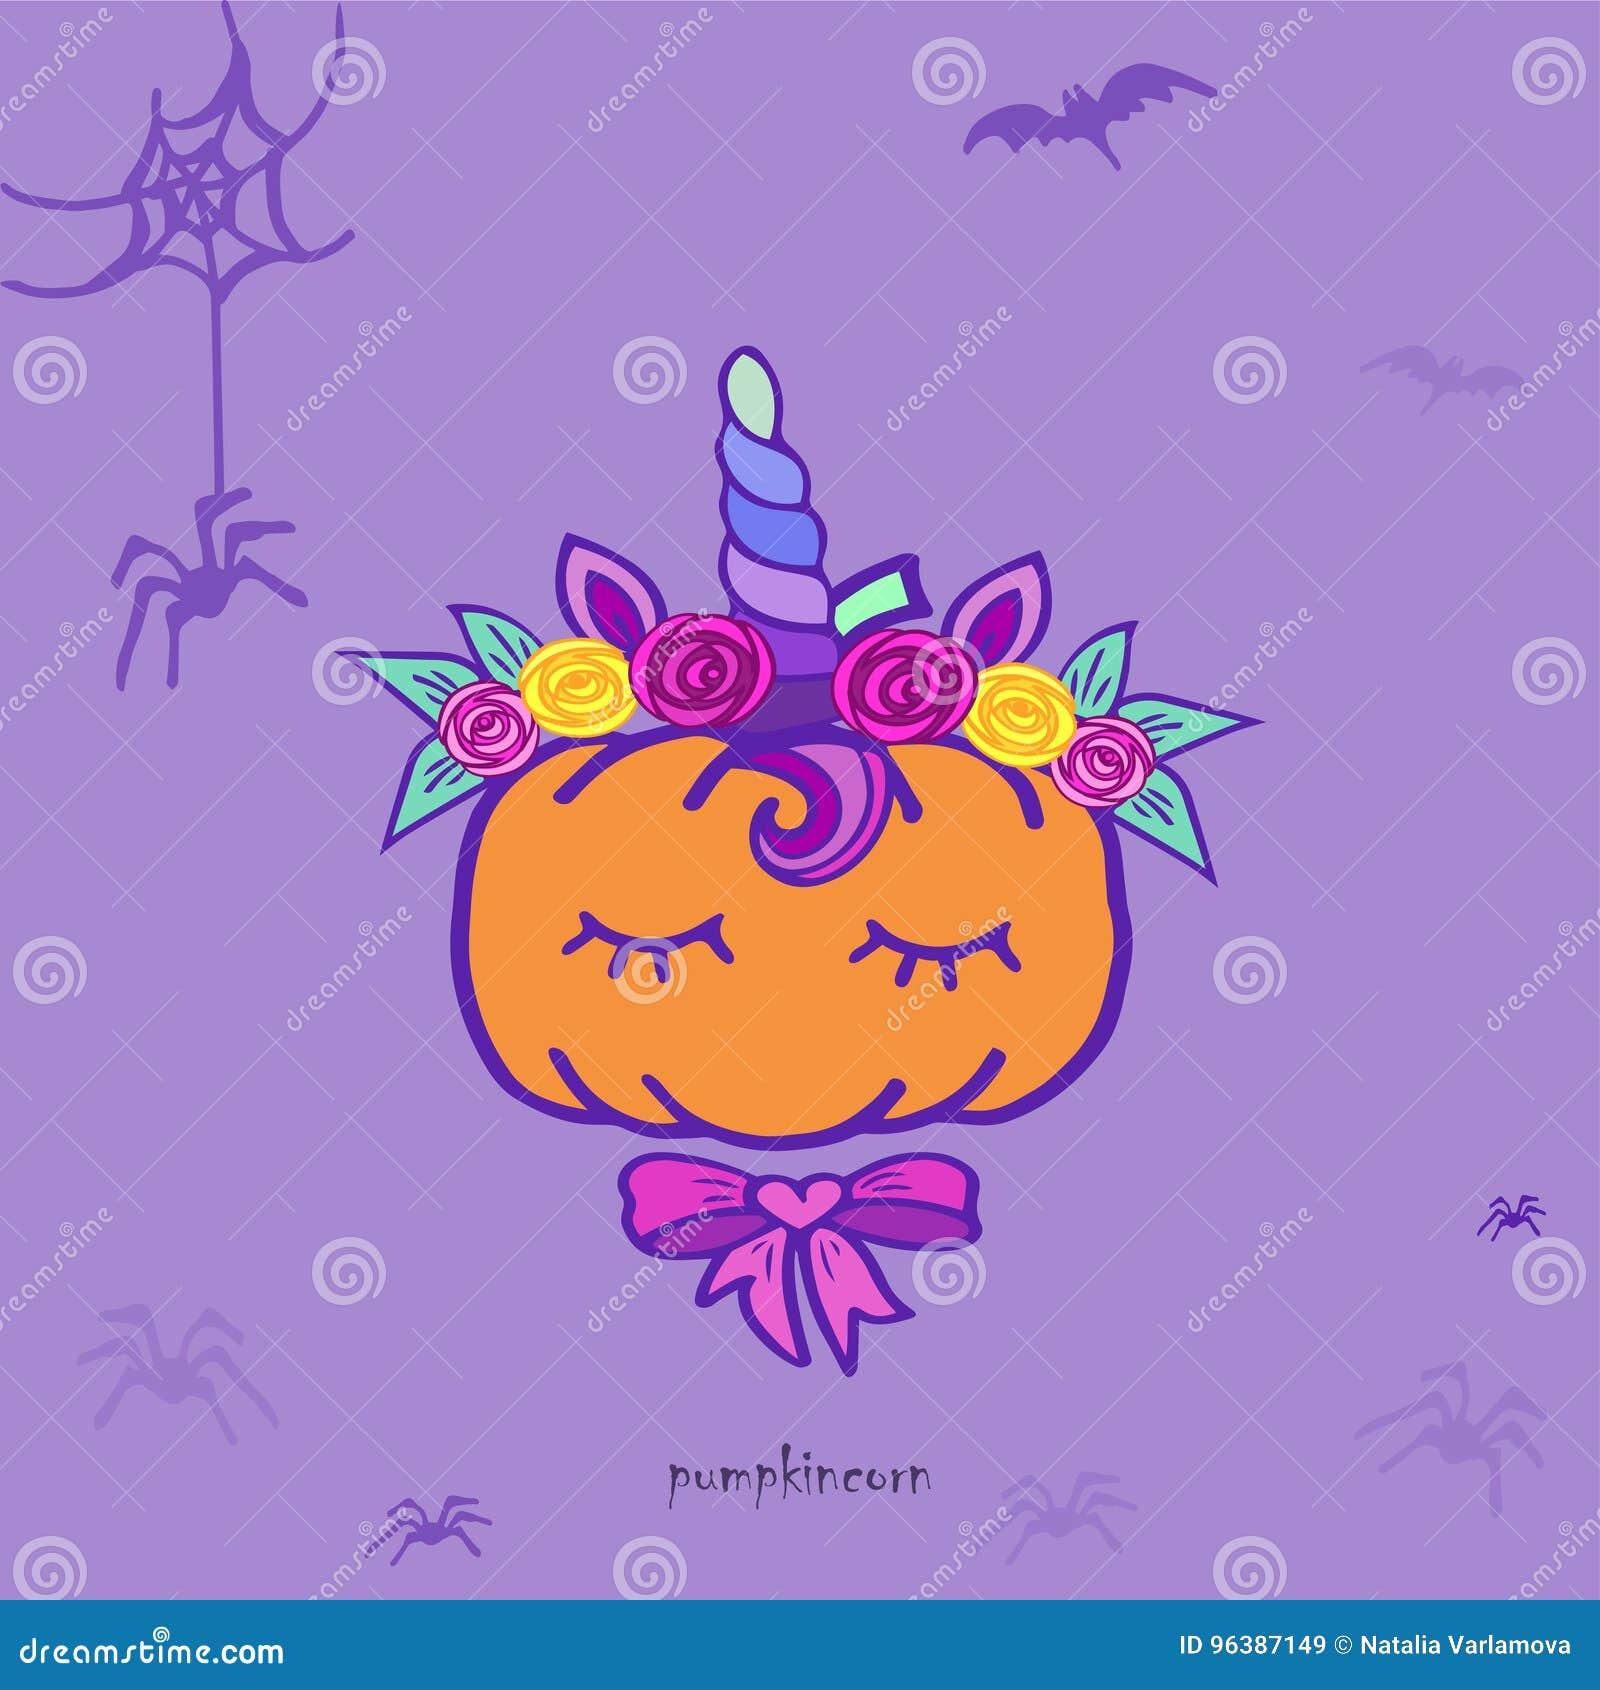 pumpkin unicorn funny halloween card stock vector illustration